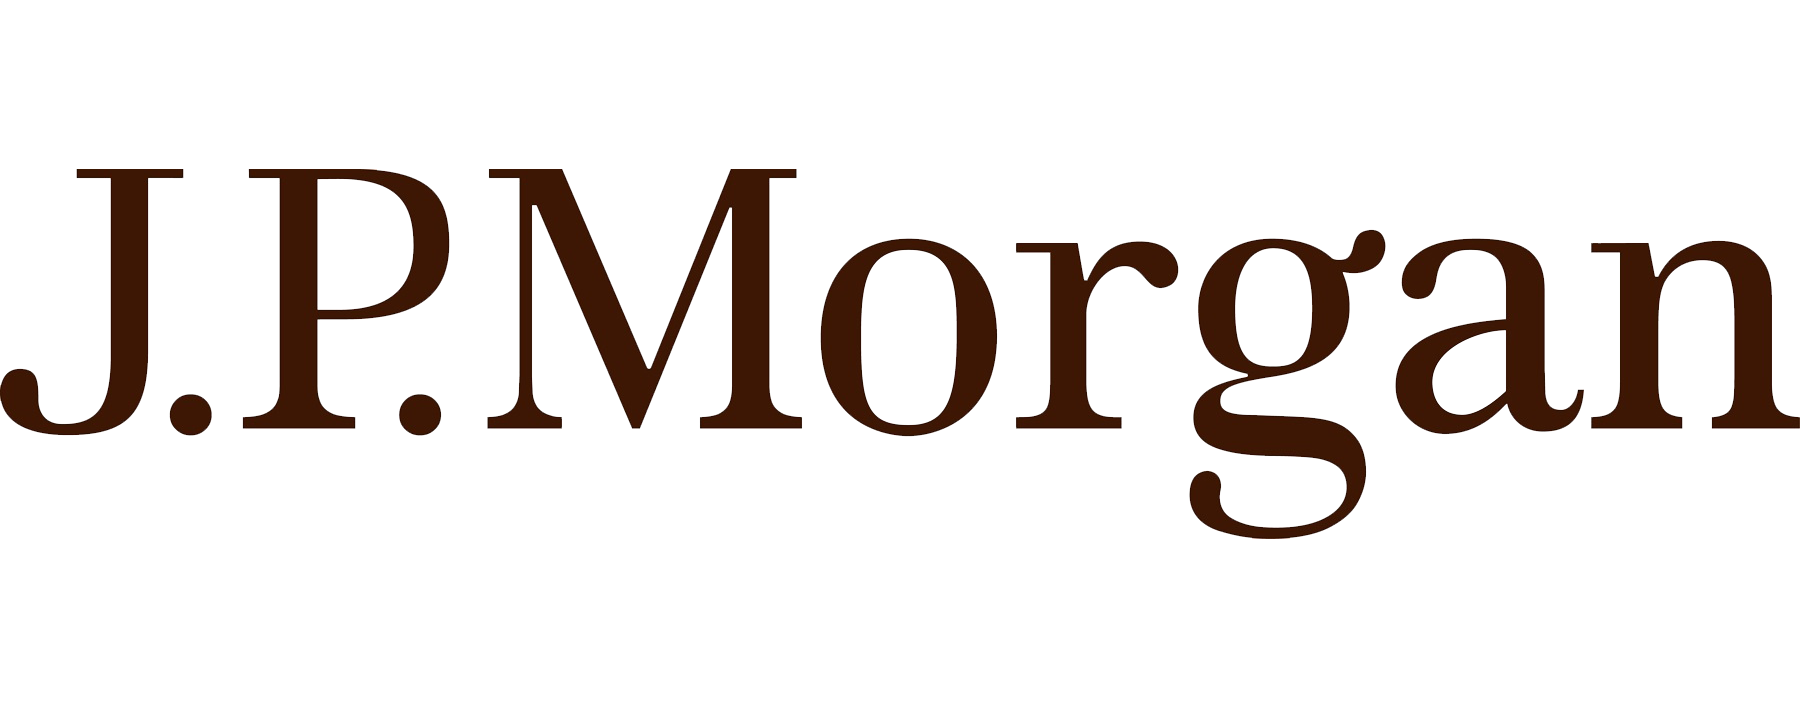 JPMorgan Chase Wave Analysis – 27 January, 2019